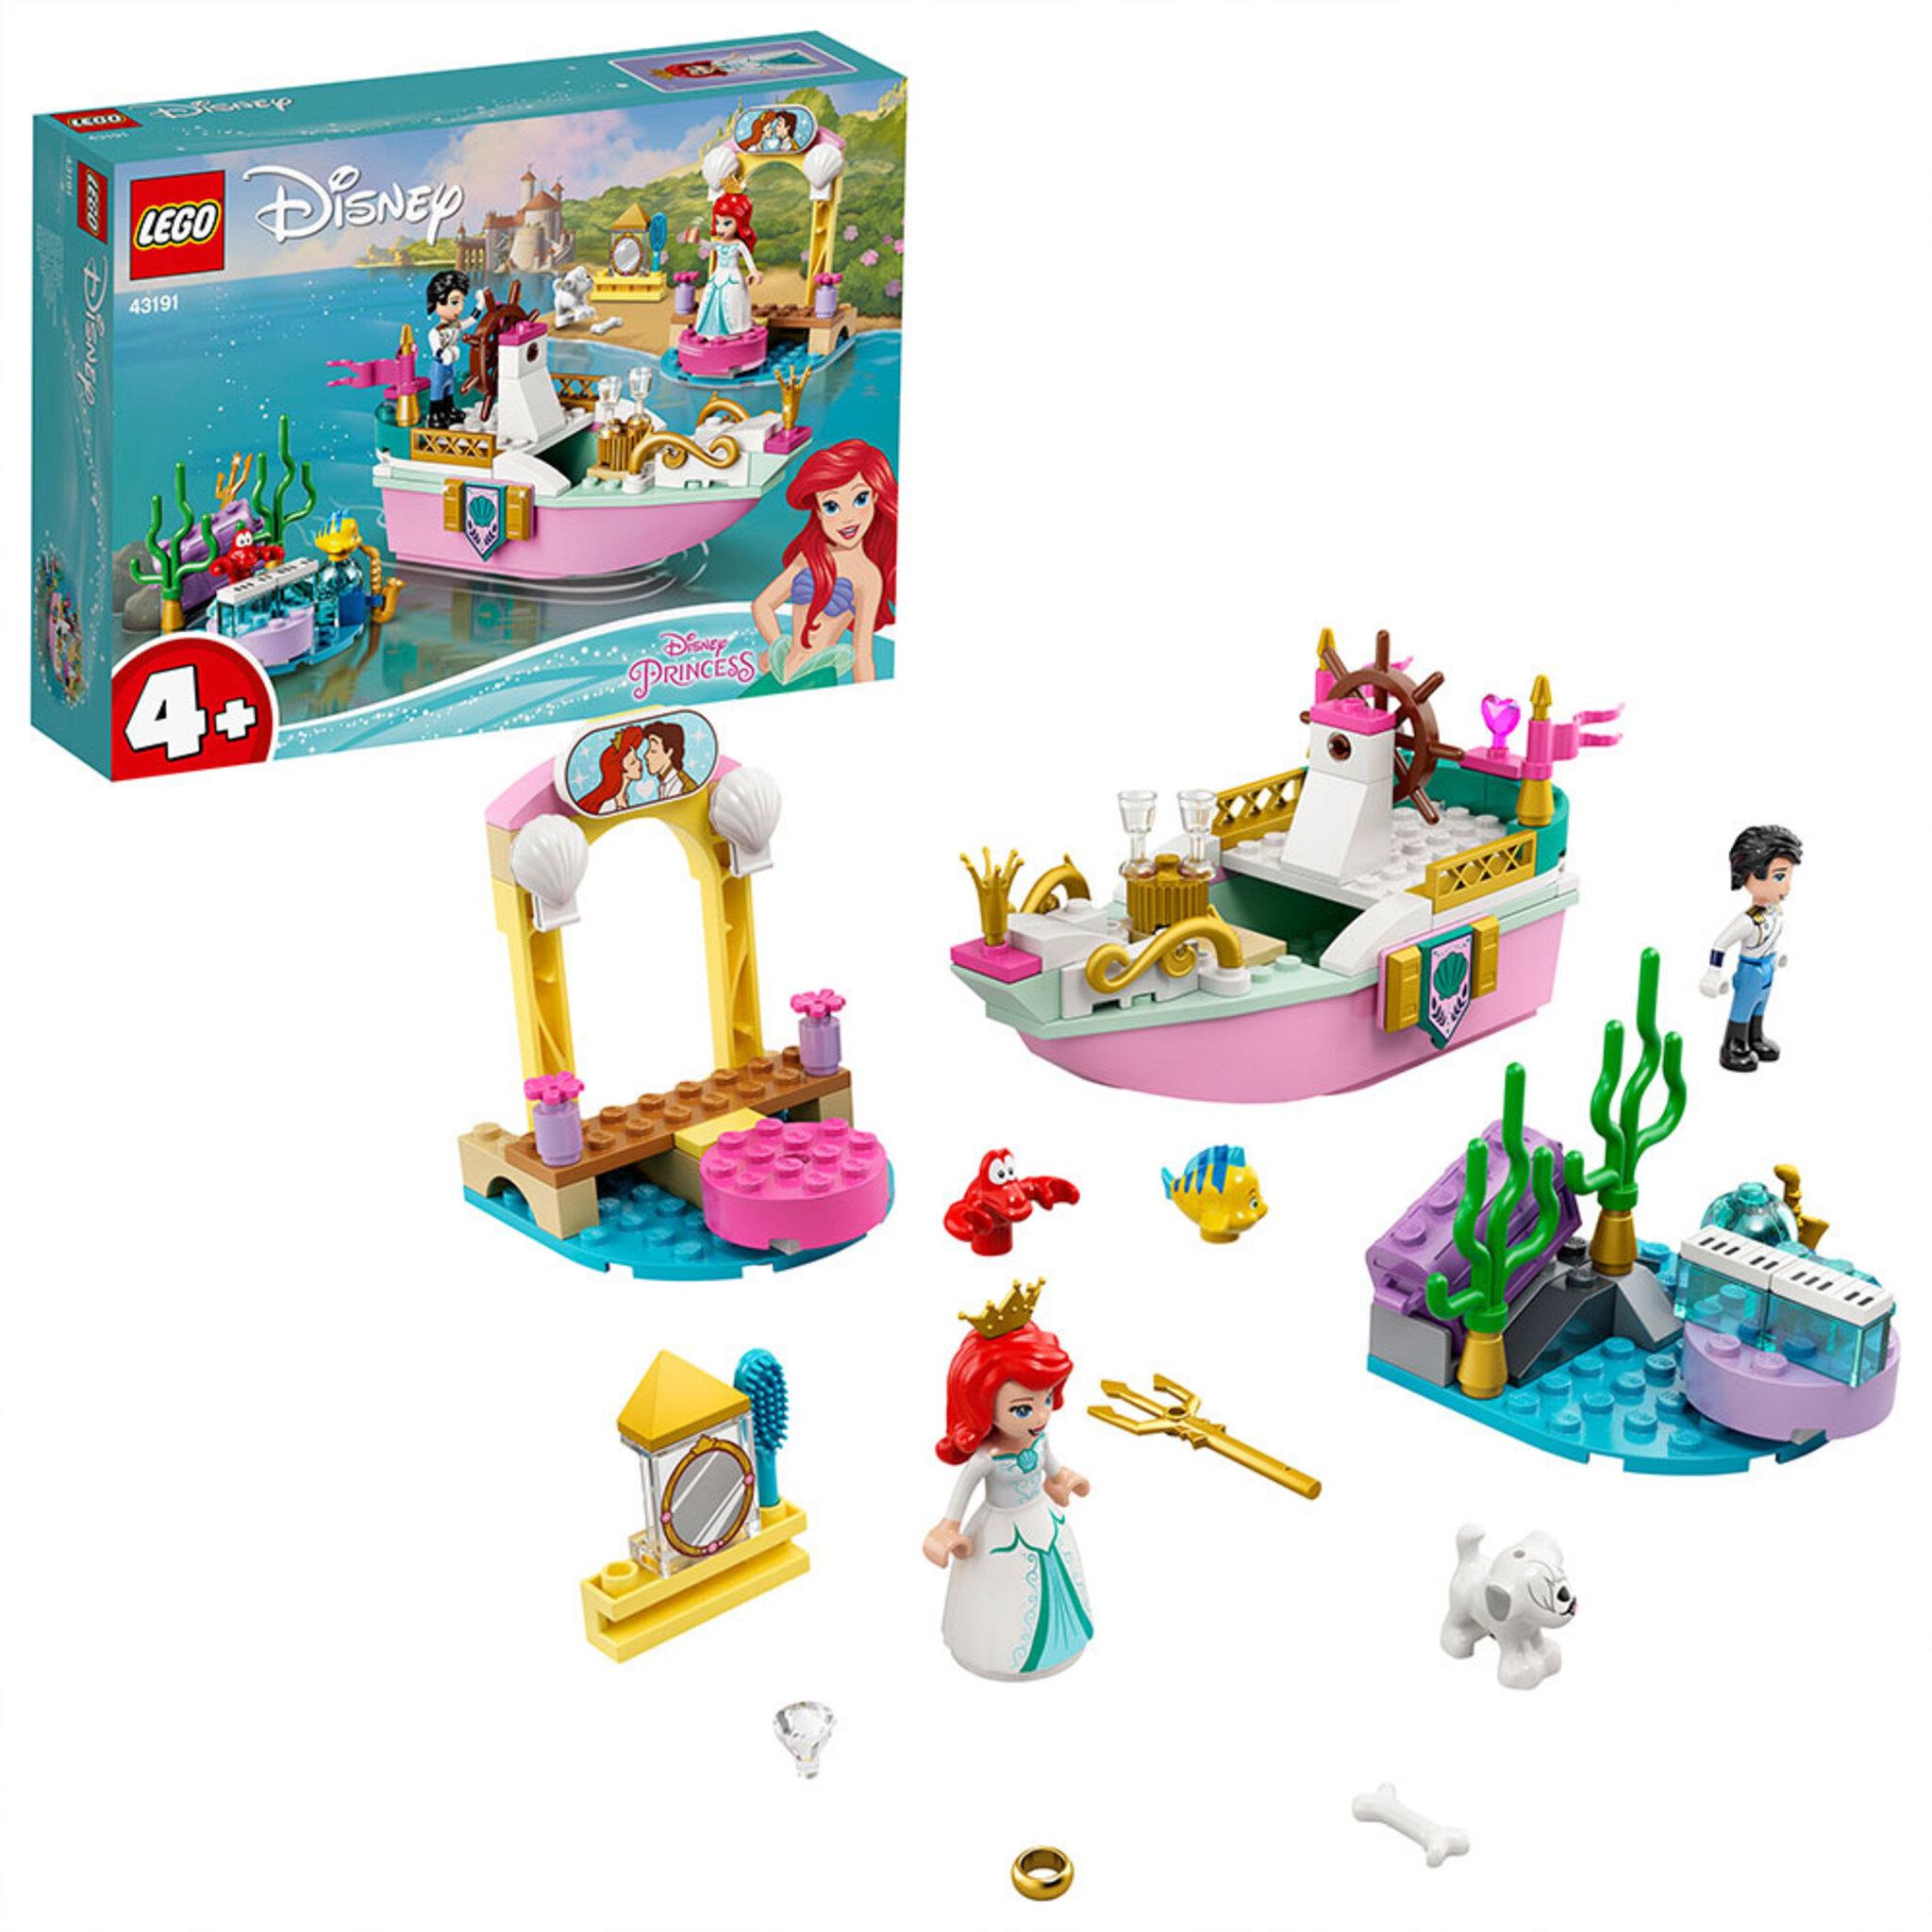 43191 Disney Princess Ariels festbåt